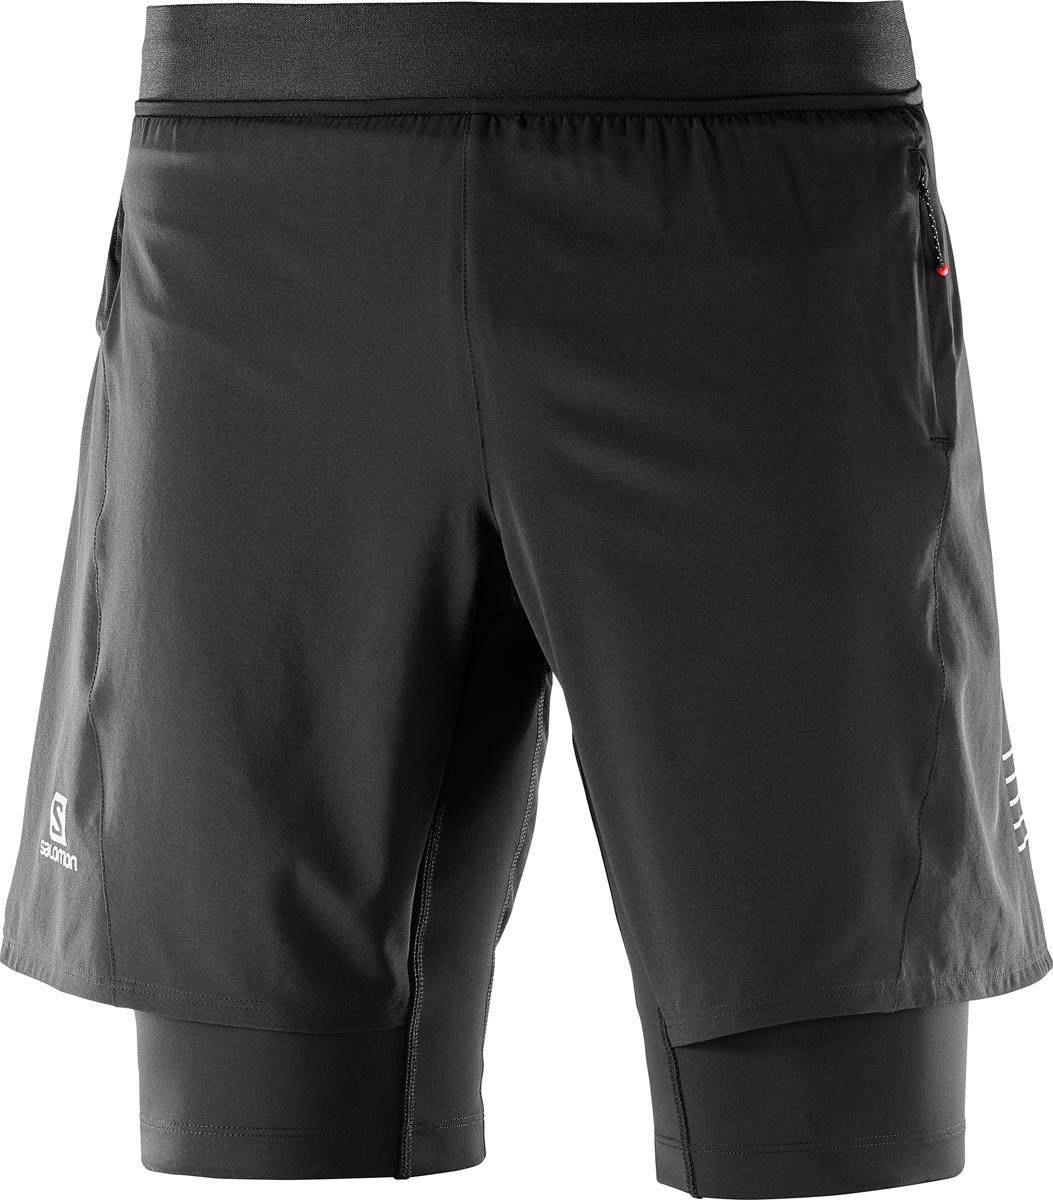 Шорты мужские Salomon Fast Wing Twinskin Short M, цвет: черный. L40108100. Размер XL (52)L40108100